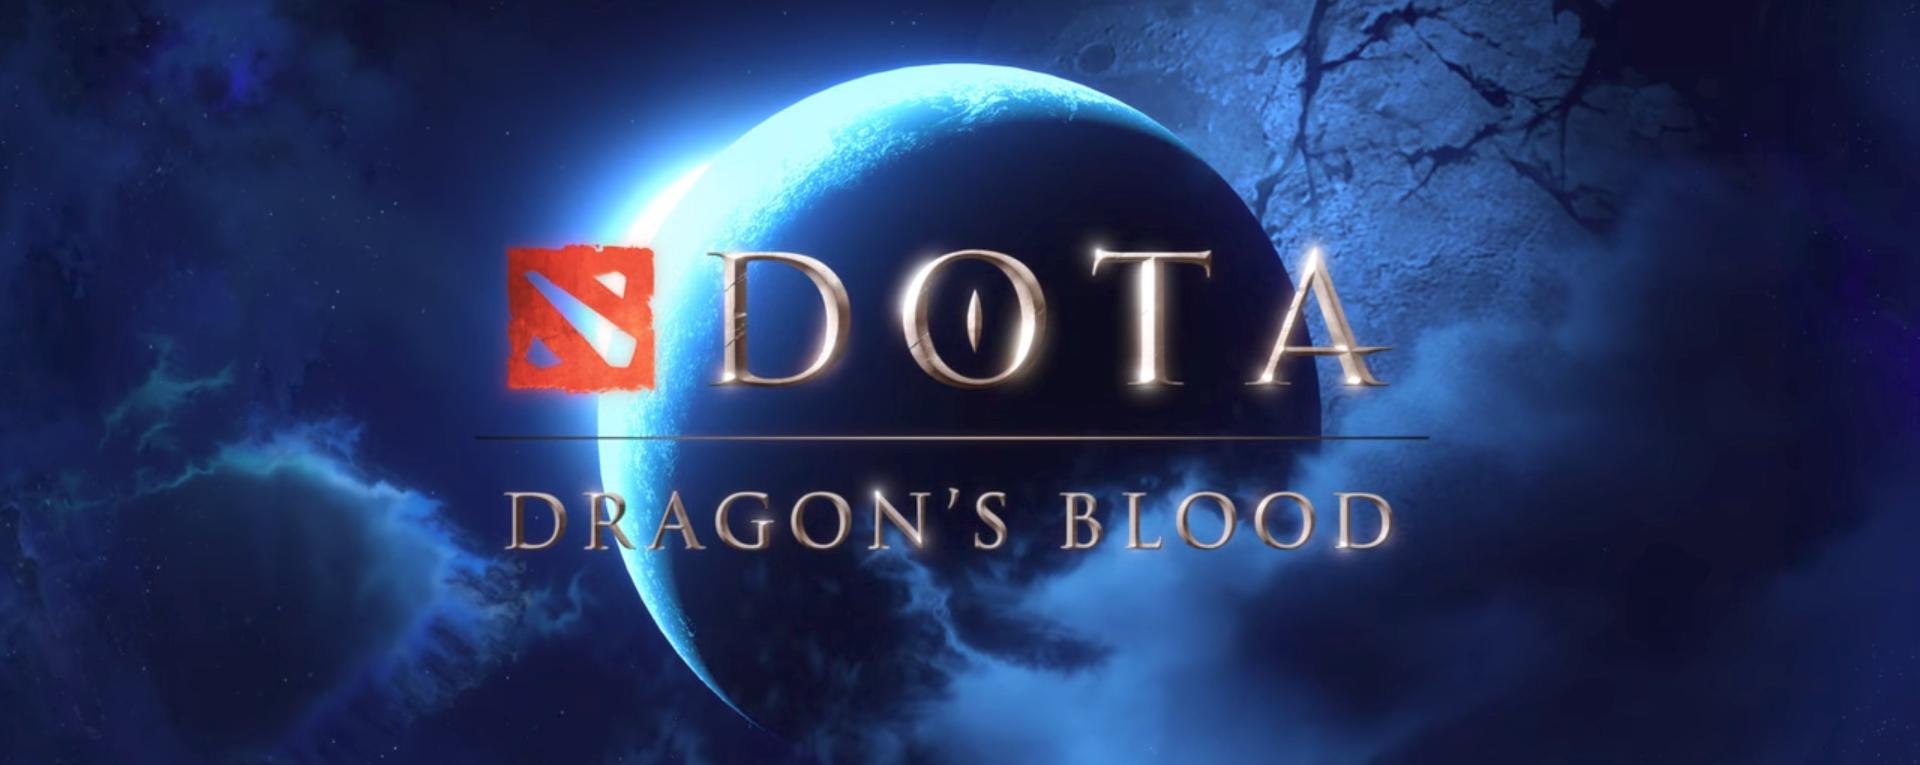 DOTA: Dragon's Blood. Image Credit: Netflix.